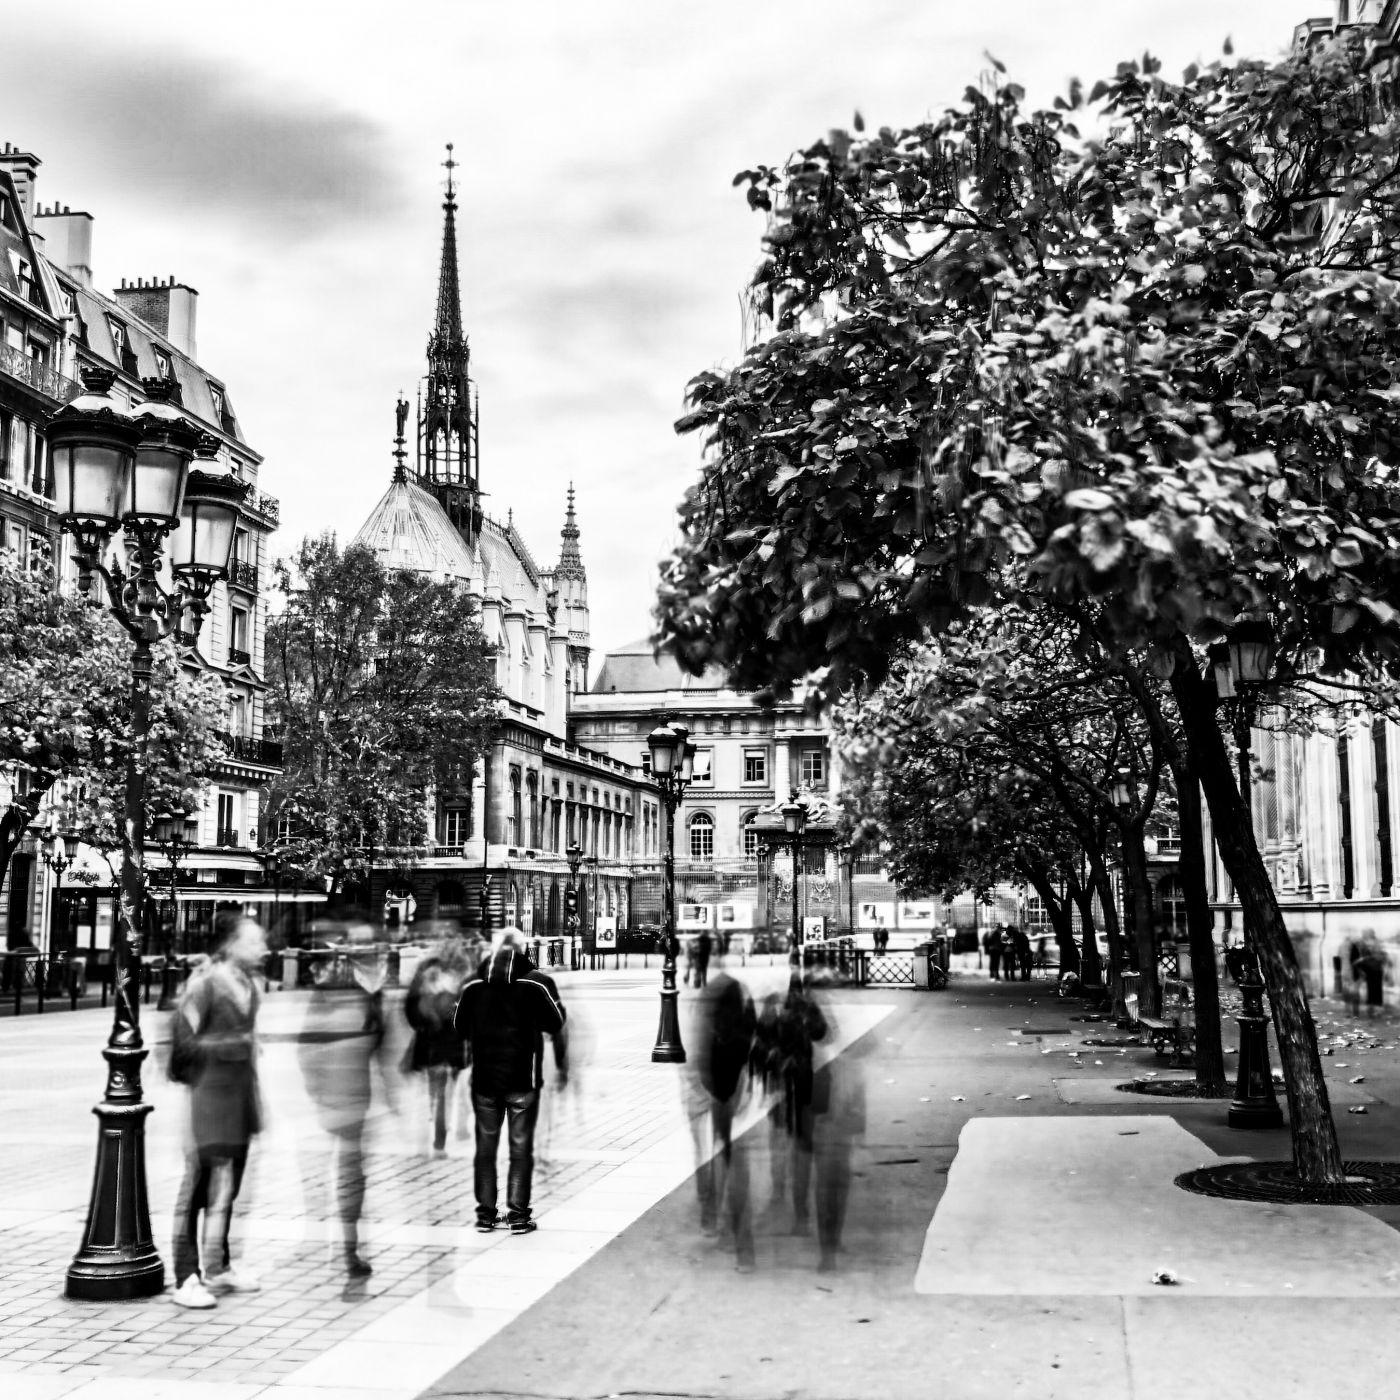 Sainte Chapelle and plaza, France